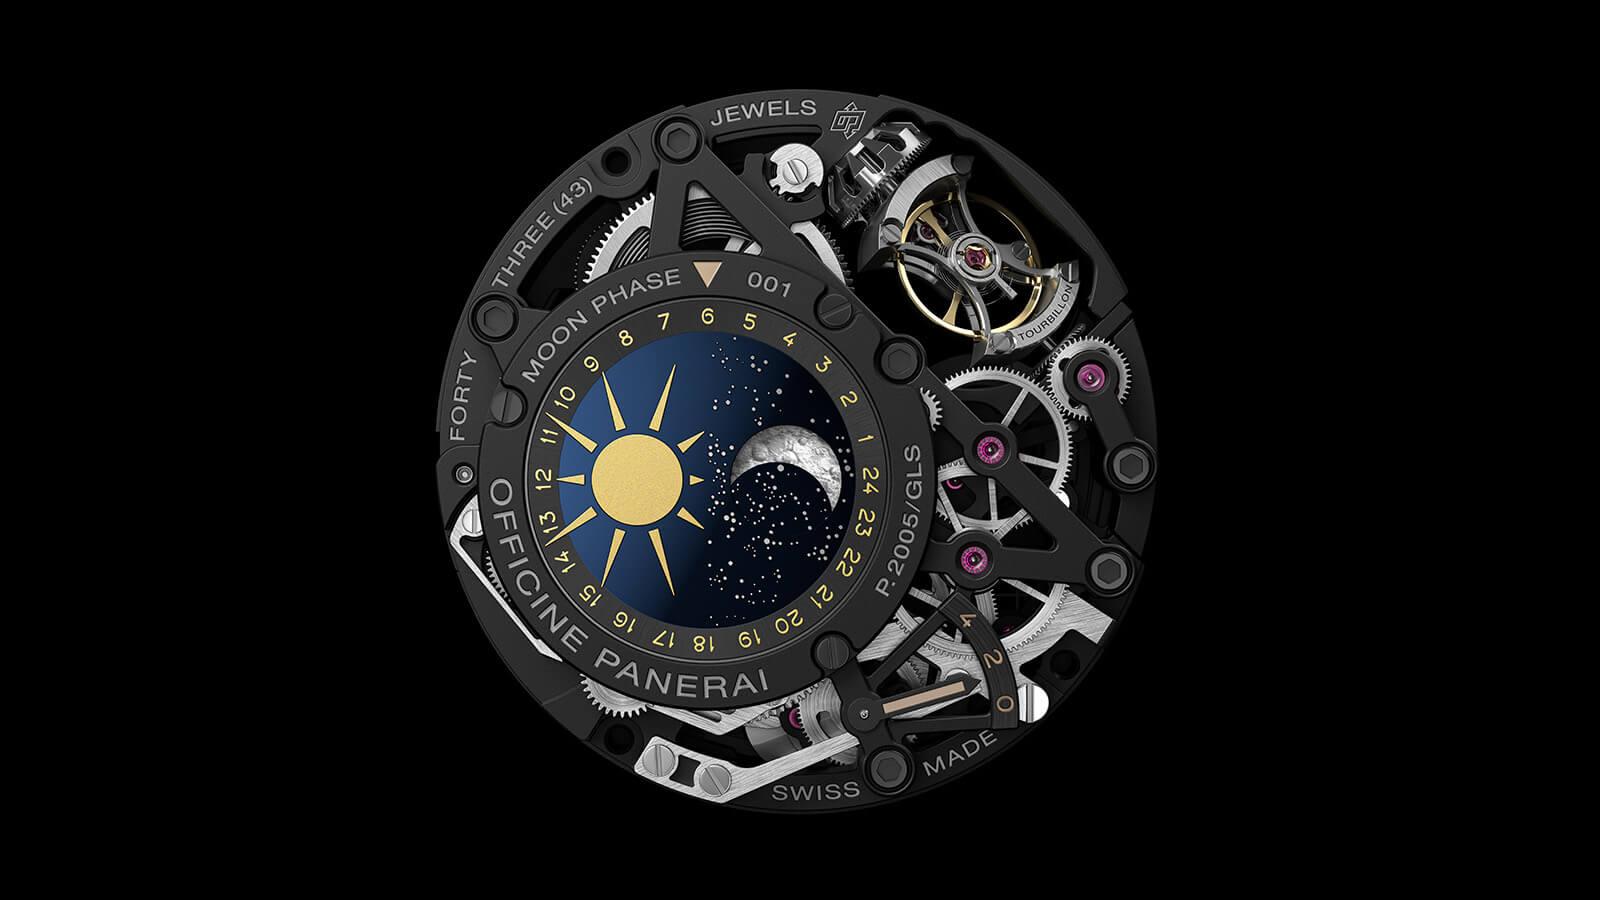 PANERAI L'Astronomo Luminor 1950 Tourbillon Moon Phases Equation of Time GMT